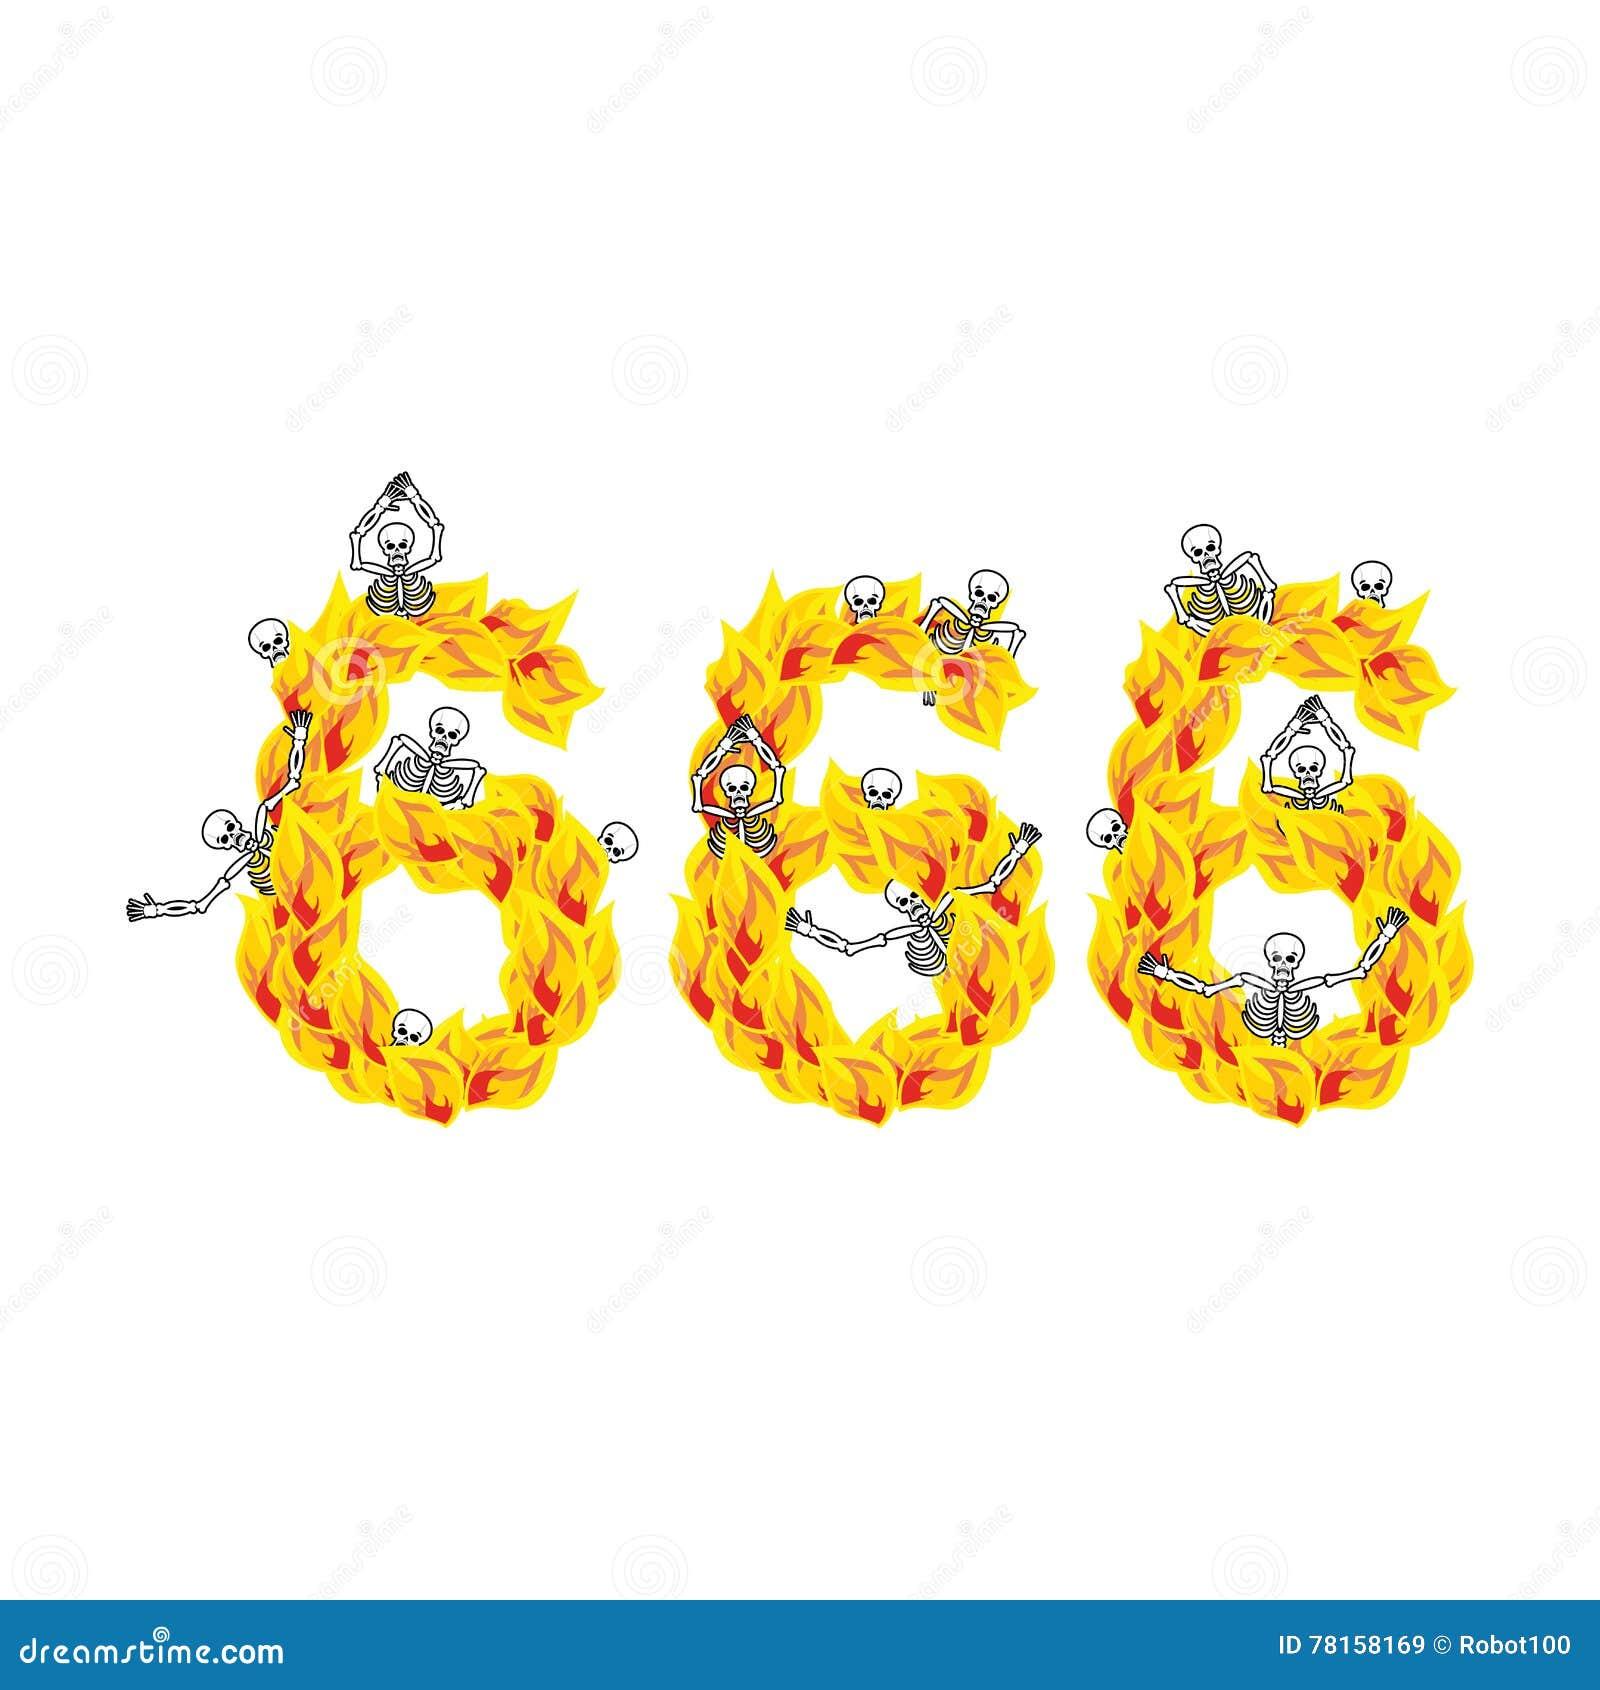 666 number of devil fire numeric skeletons in inferno sinners 666 number of devil fire numeric skeletons in inferno sinners biocorpaavc